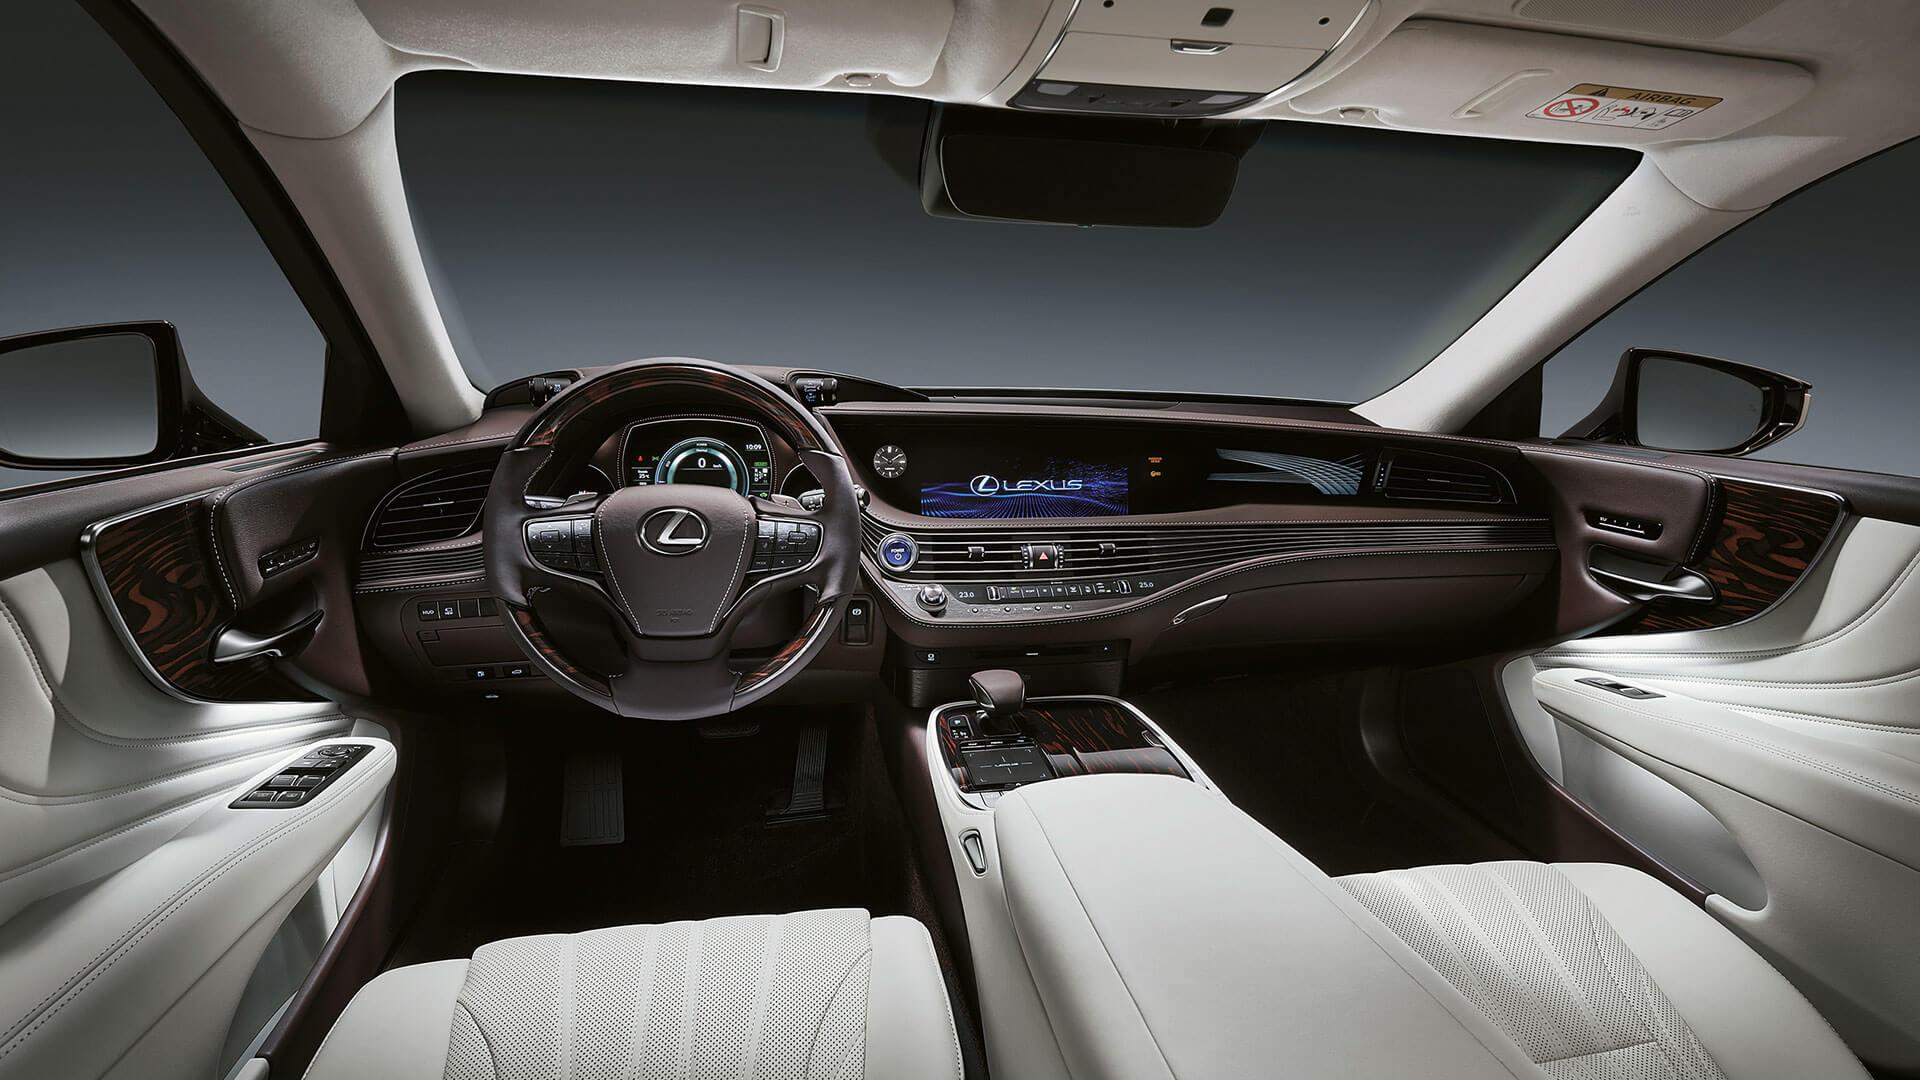 2018 lexus ls features driver focused cockpit